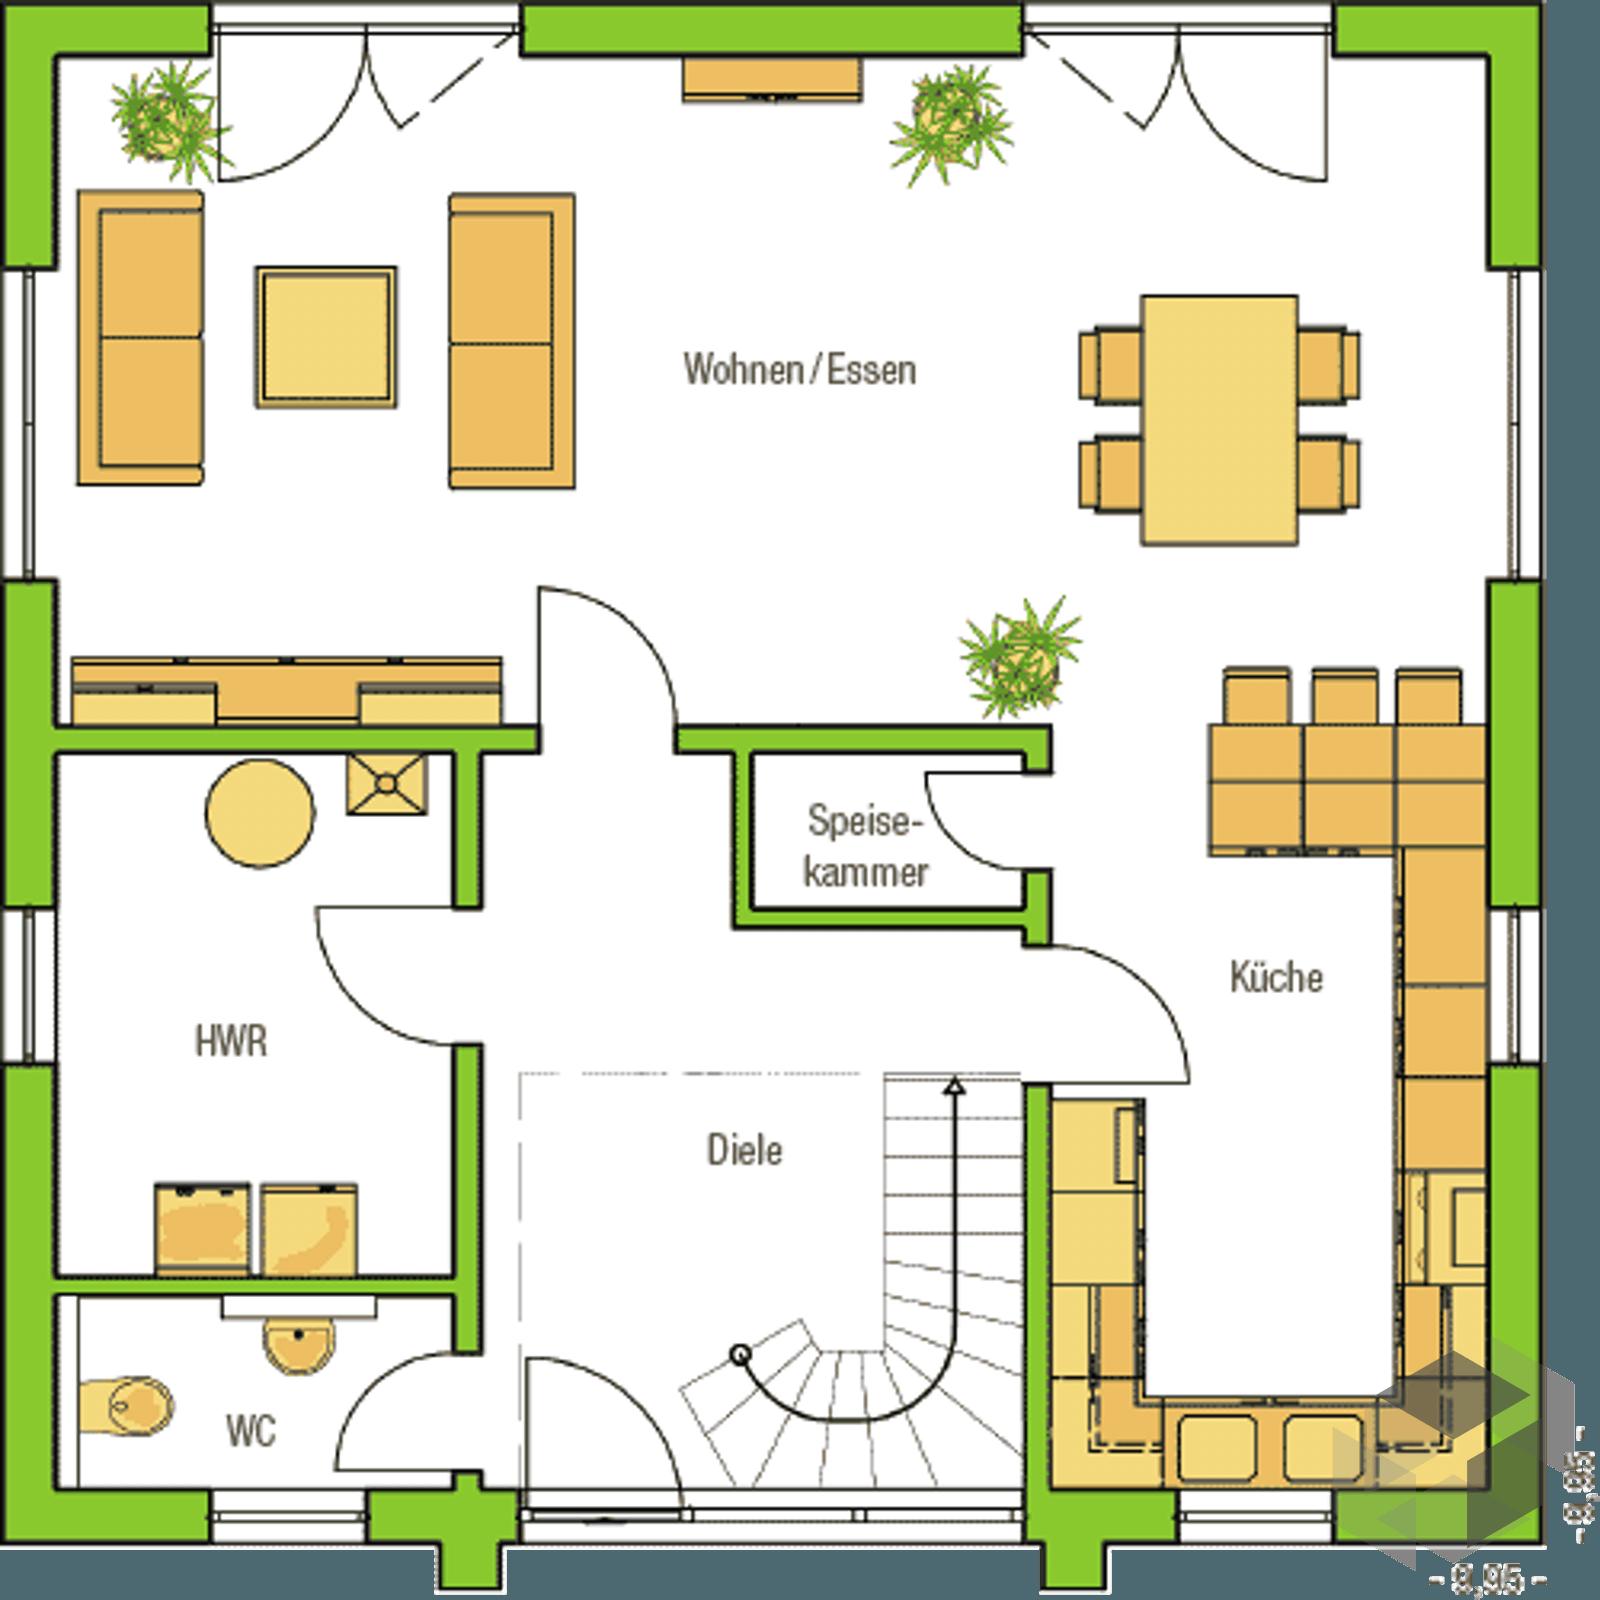 wiesbaden inactive von helma eigenheimbau komplette daten bersicht. Black Bedroom Furniture Sets. Home Design Ideas